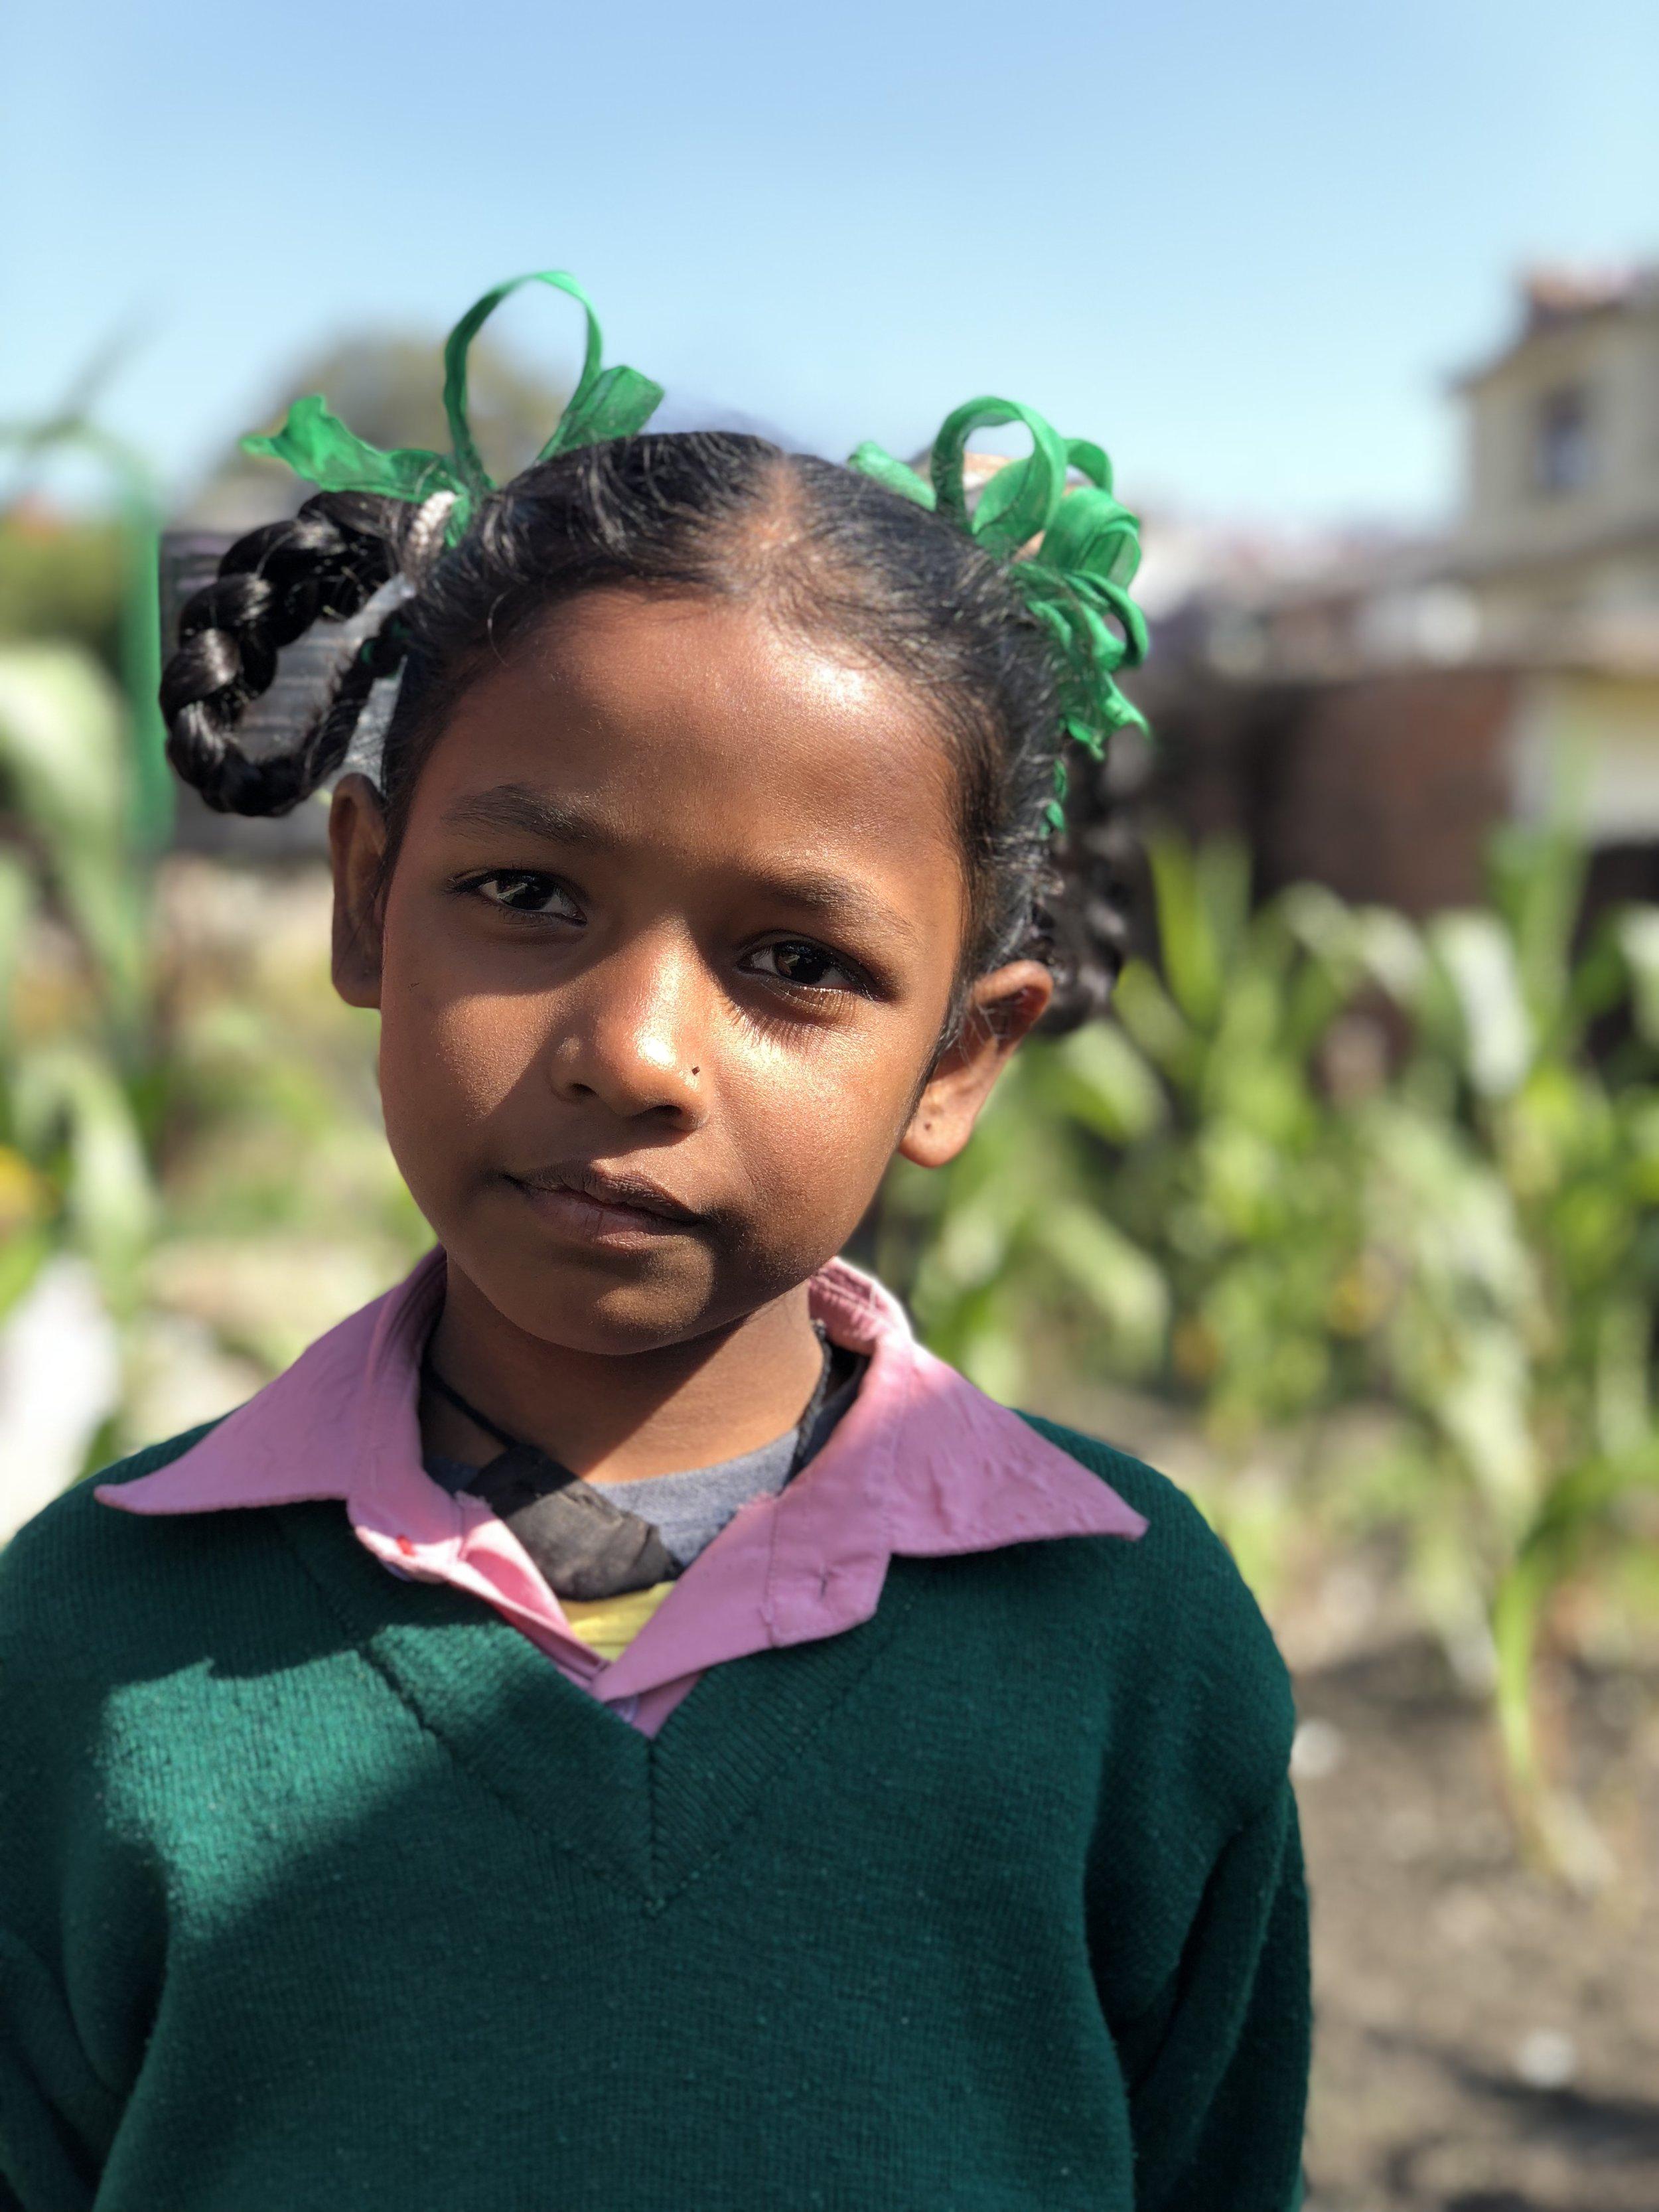 Jyoti  Age 8  Her favorite bird is the parrot